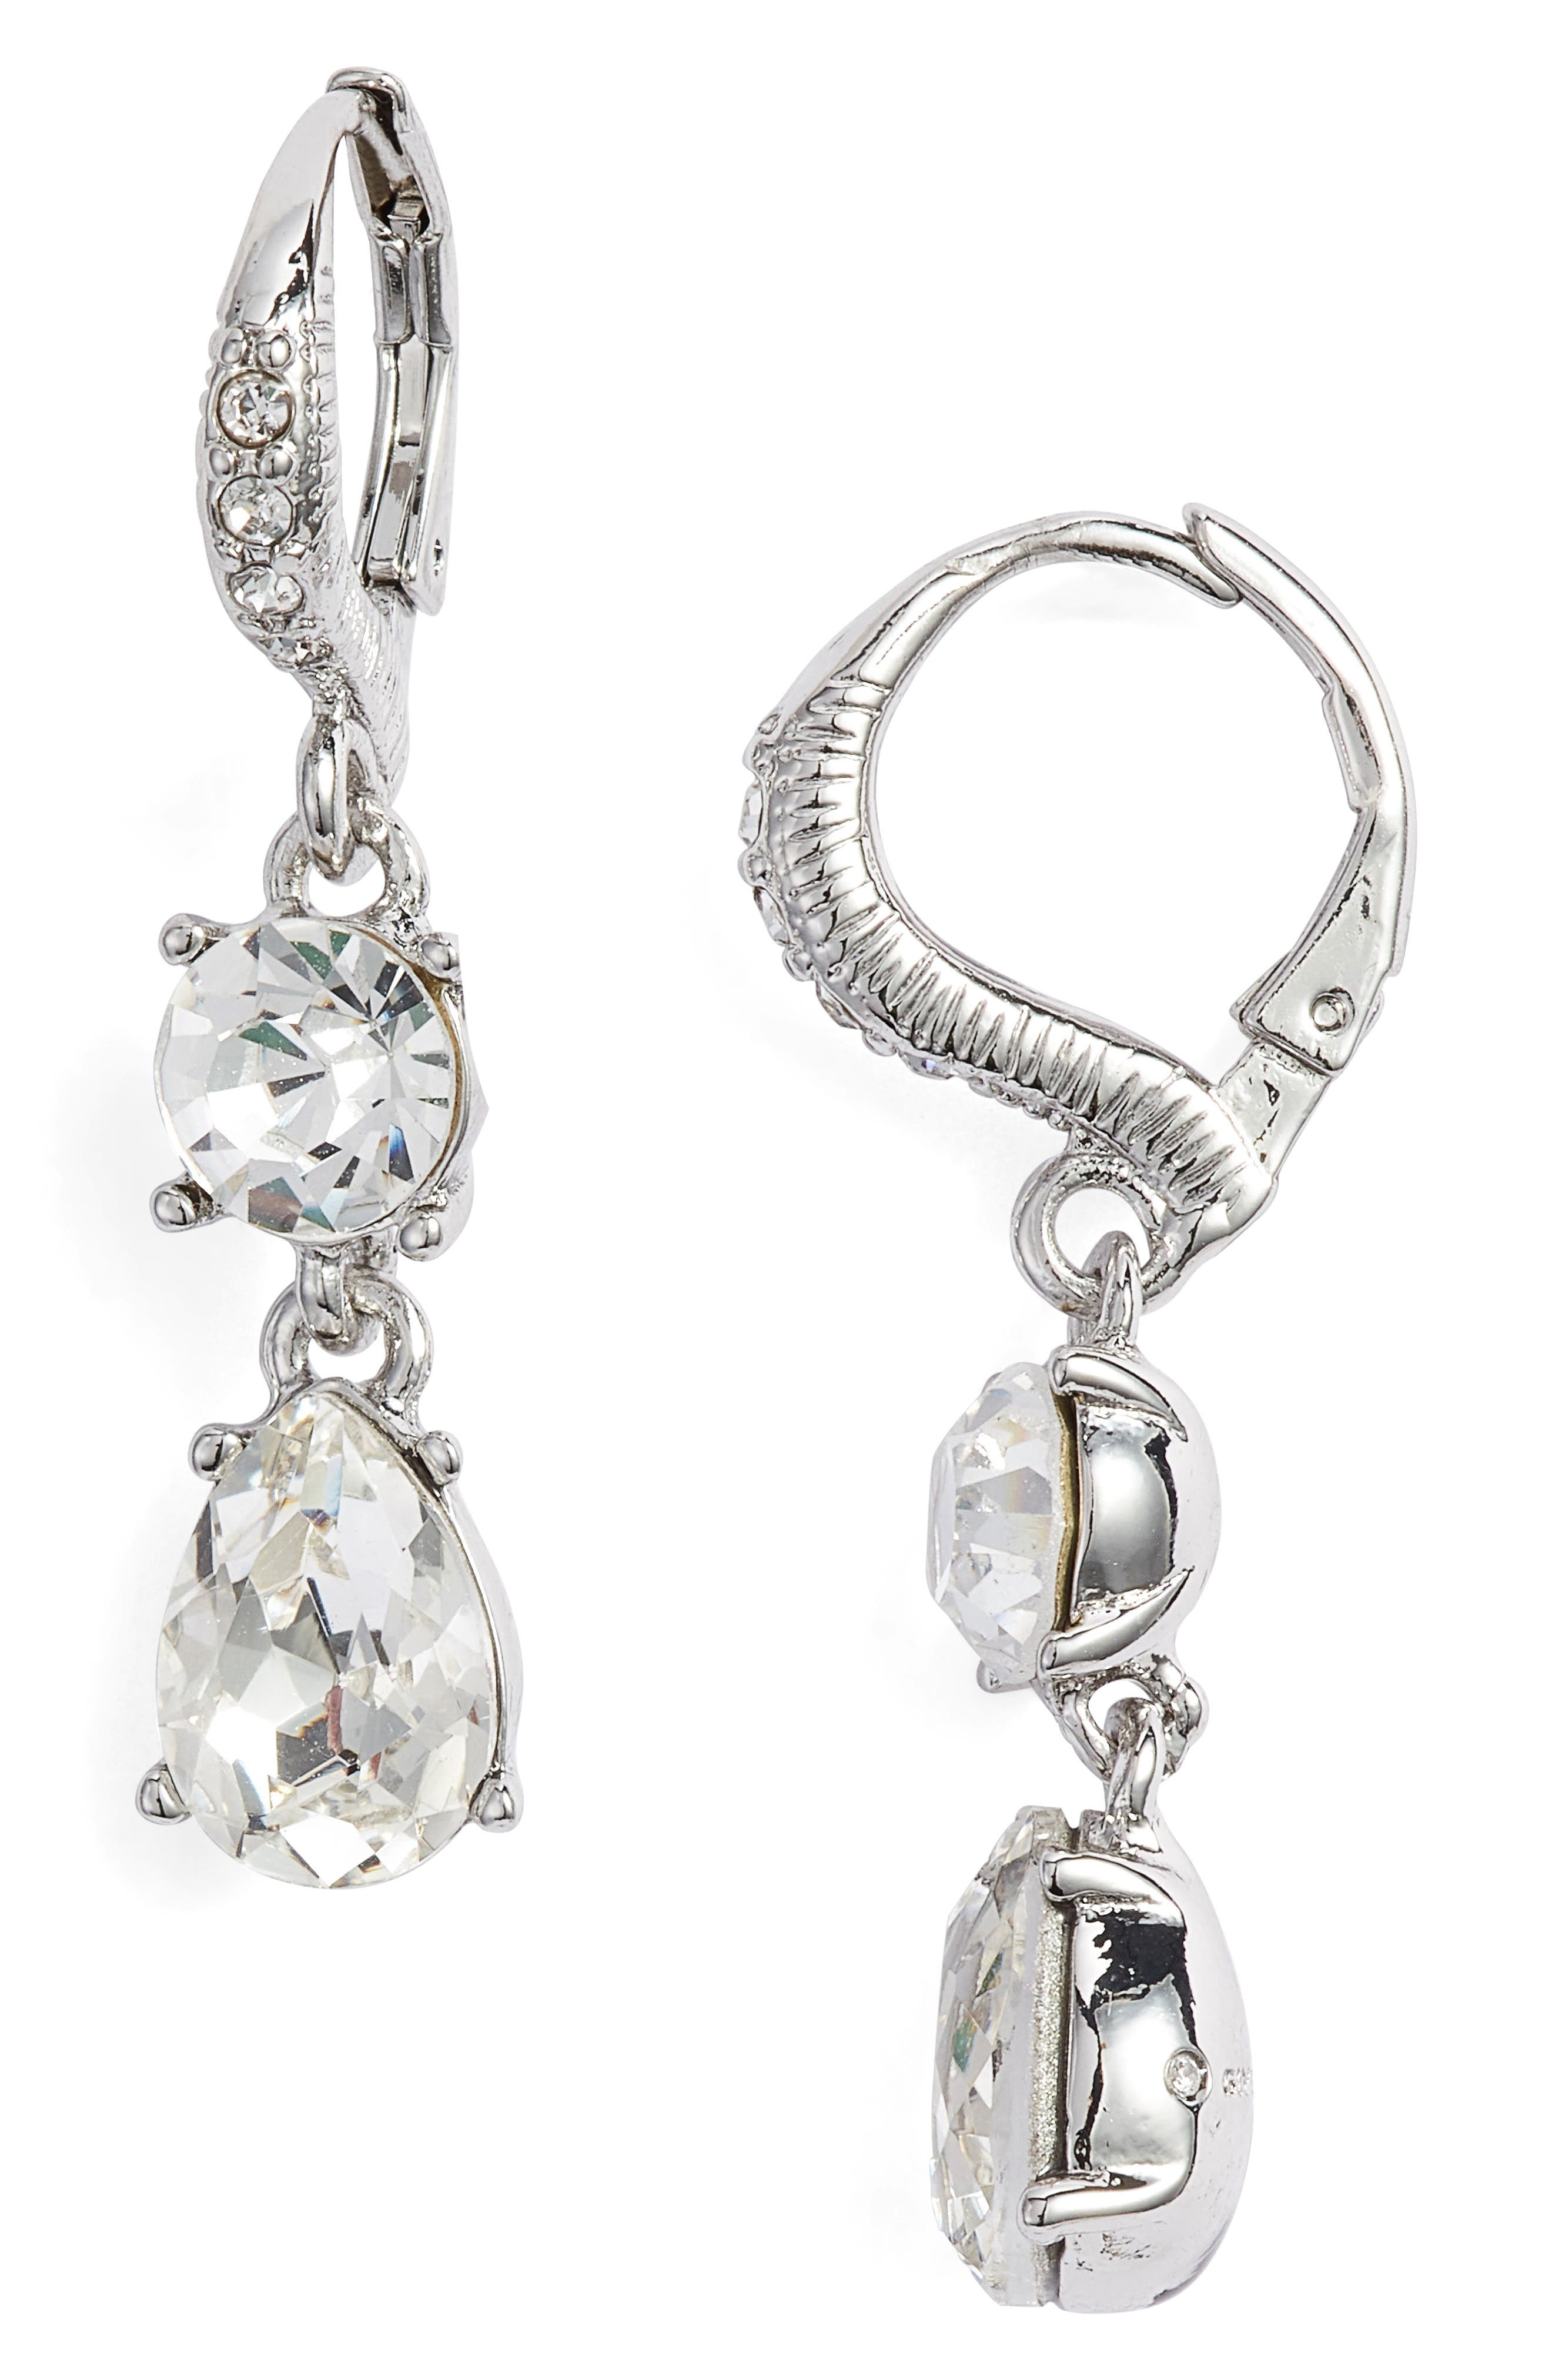 Small Crystal Drop Earrings,                             Main thumbnail 1, color,                             SILVER